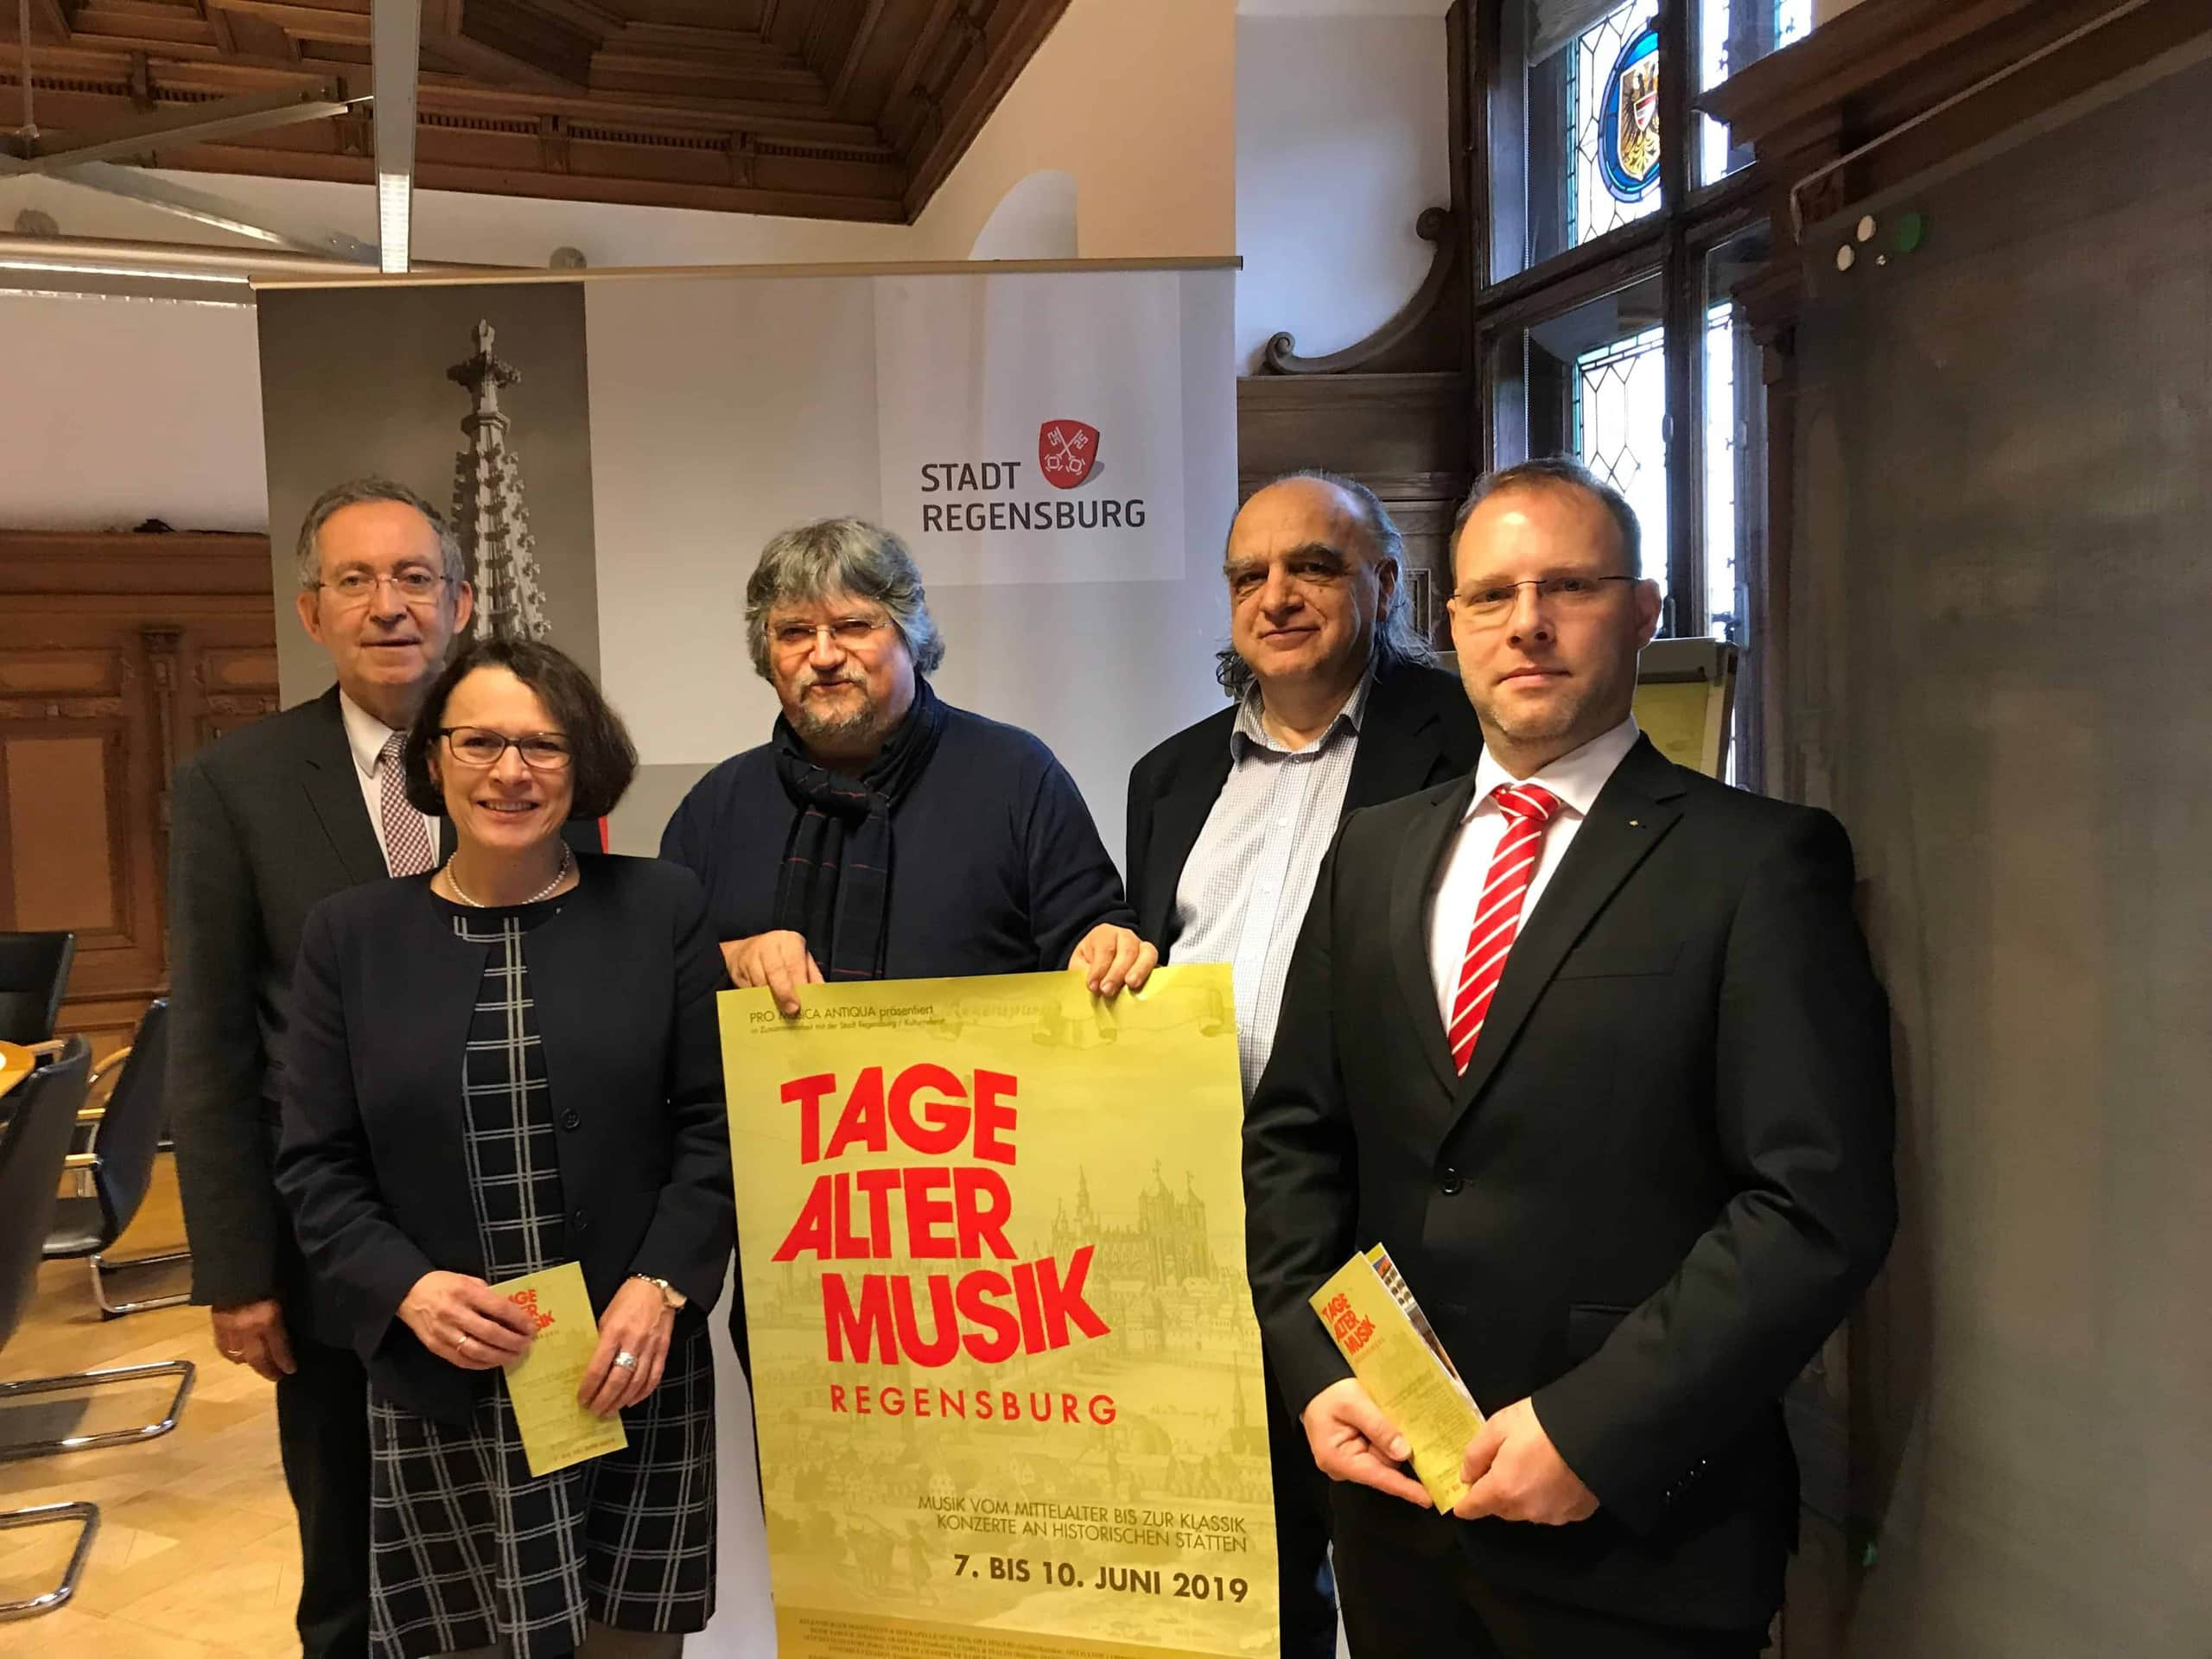 Tage Alter Musik 2019: Großartiges Programm Vorverkauf läuft